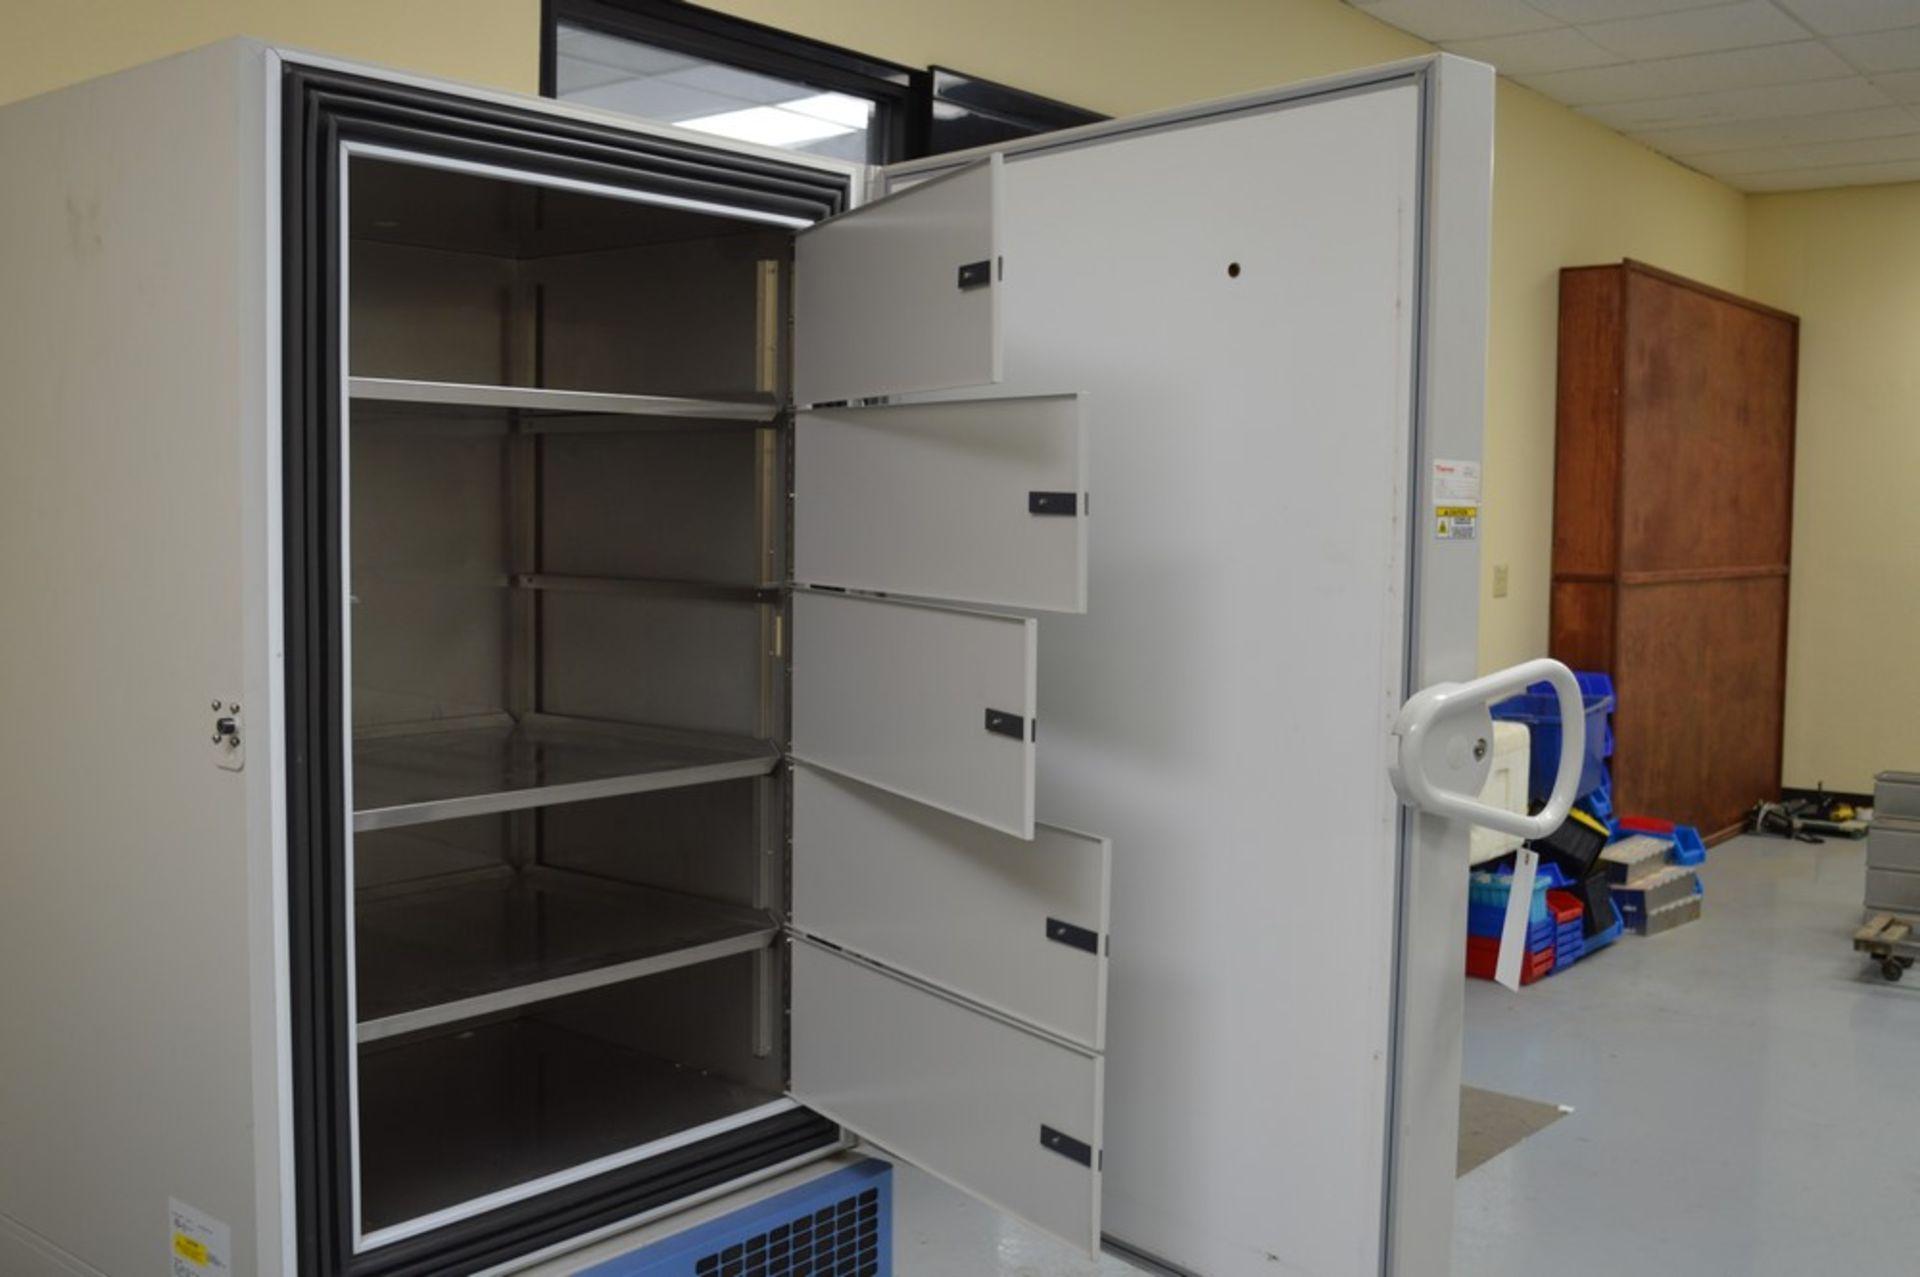 Therma Scientific Forma 8600 Series, Model 8656 Deep Freeze Refrigorator (-86 F) - Image 5 of 7